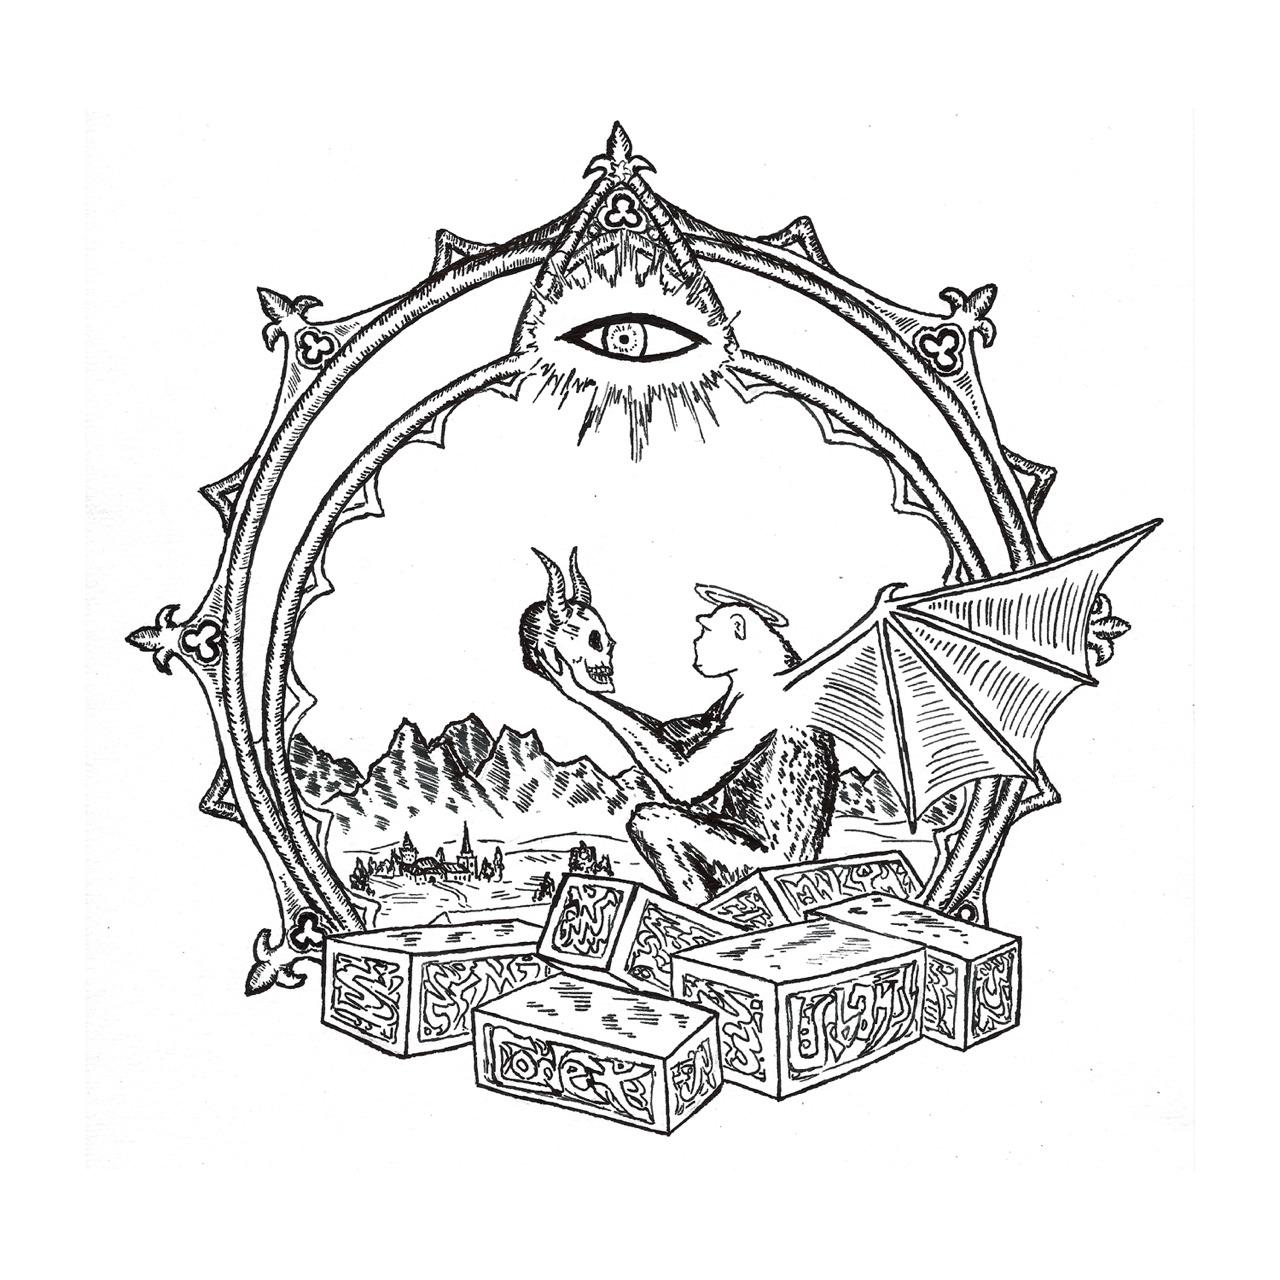 Simius Mylenæ